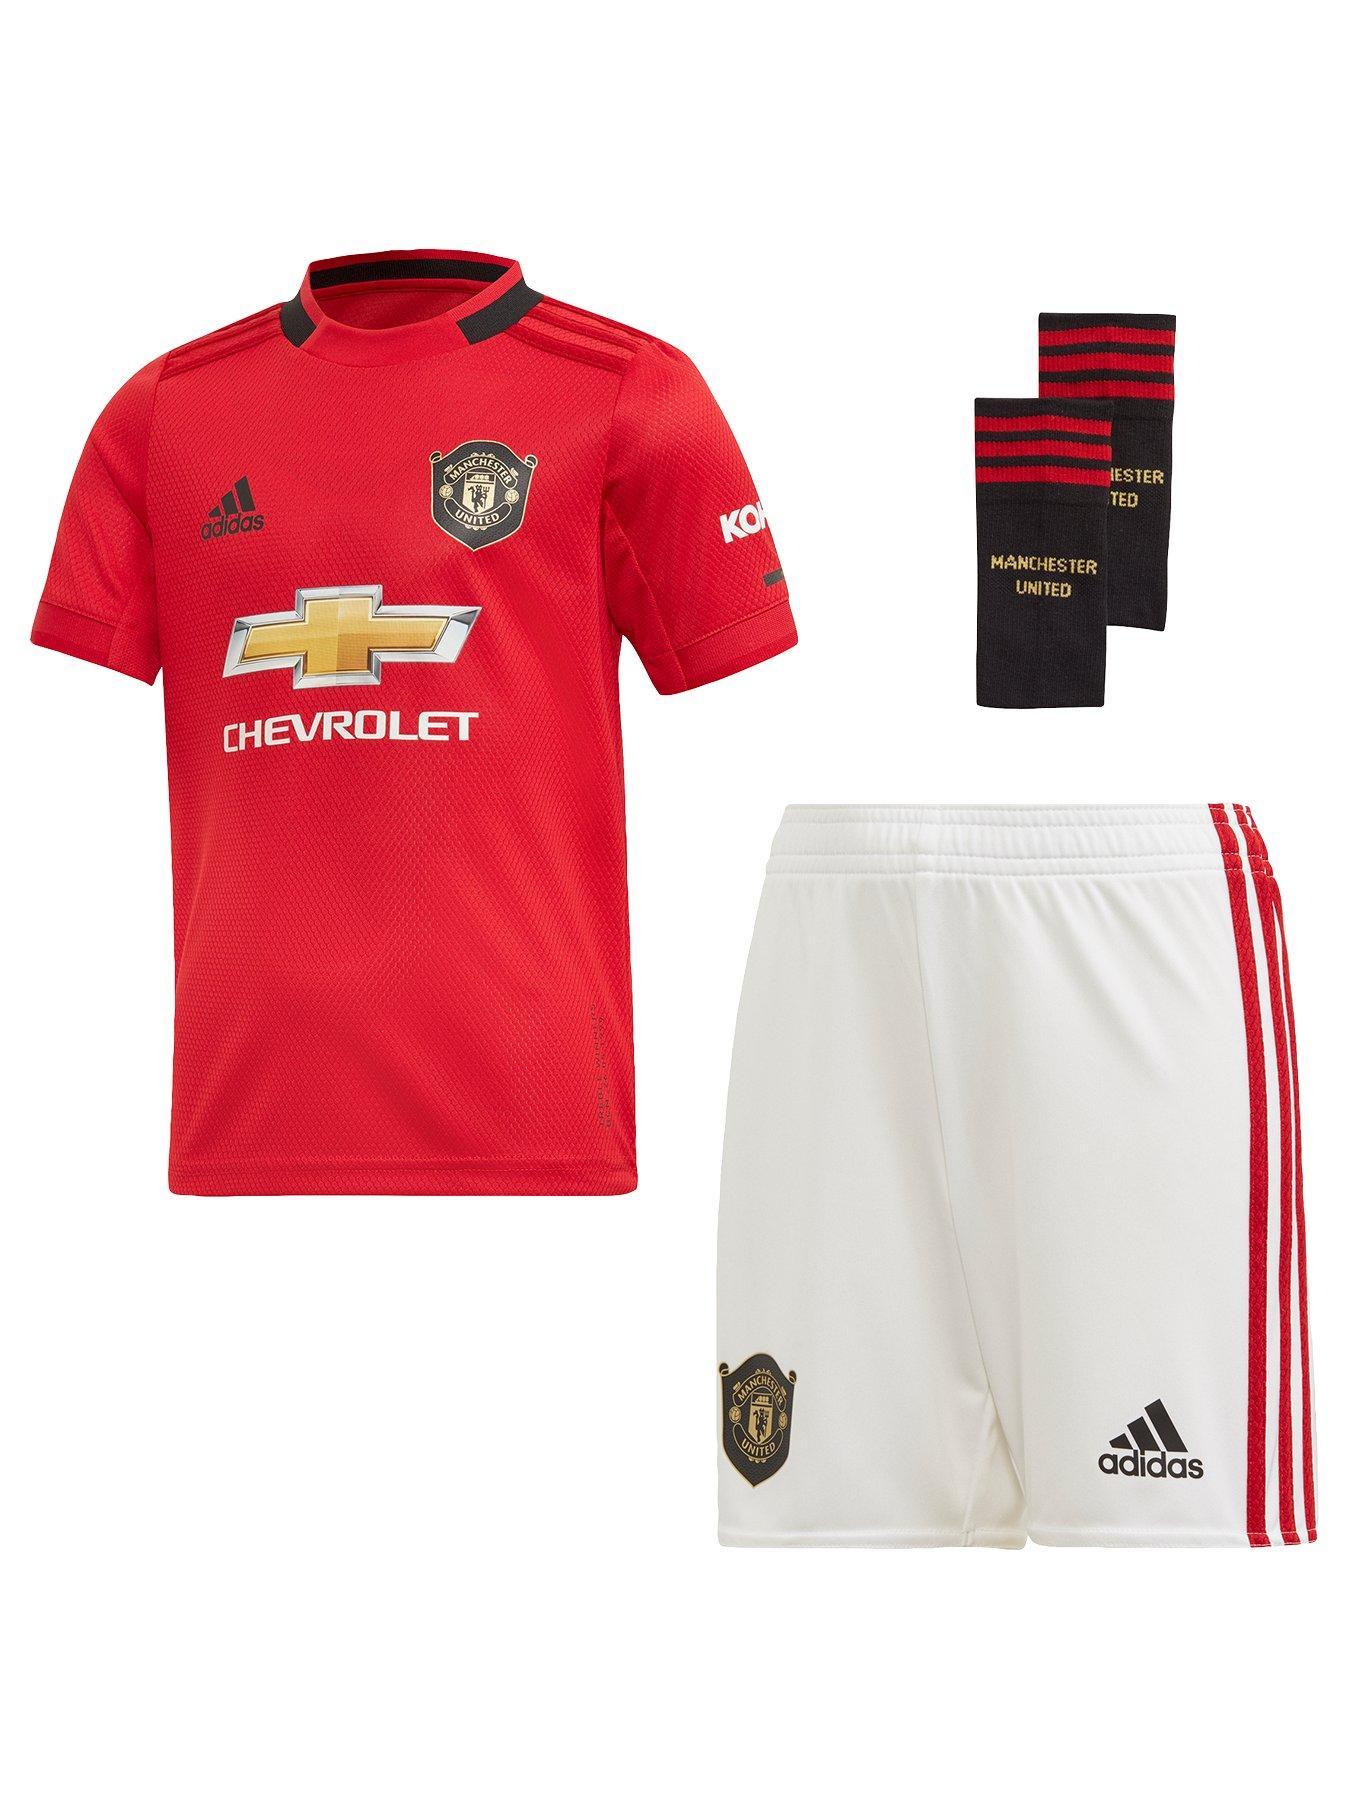 Football shirts & kits   Sportswear   Child & baby   www